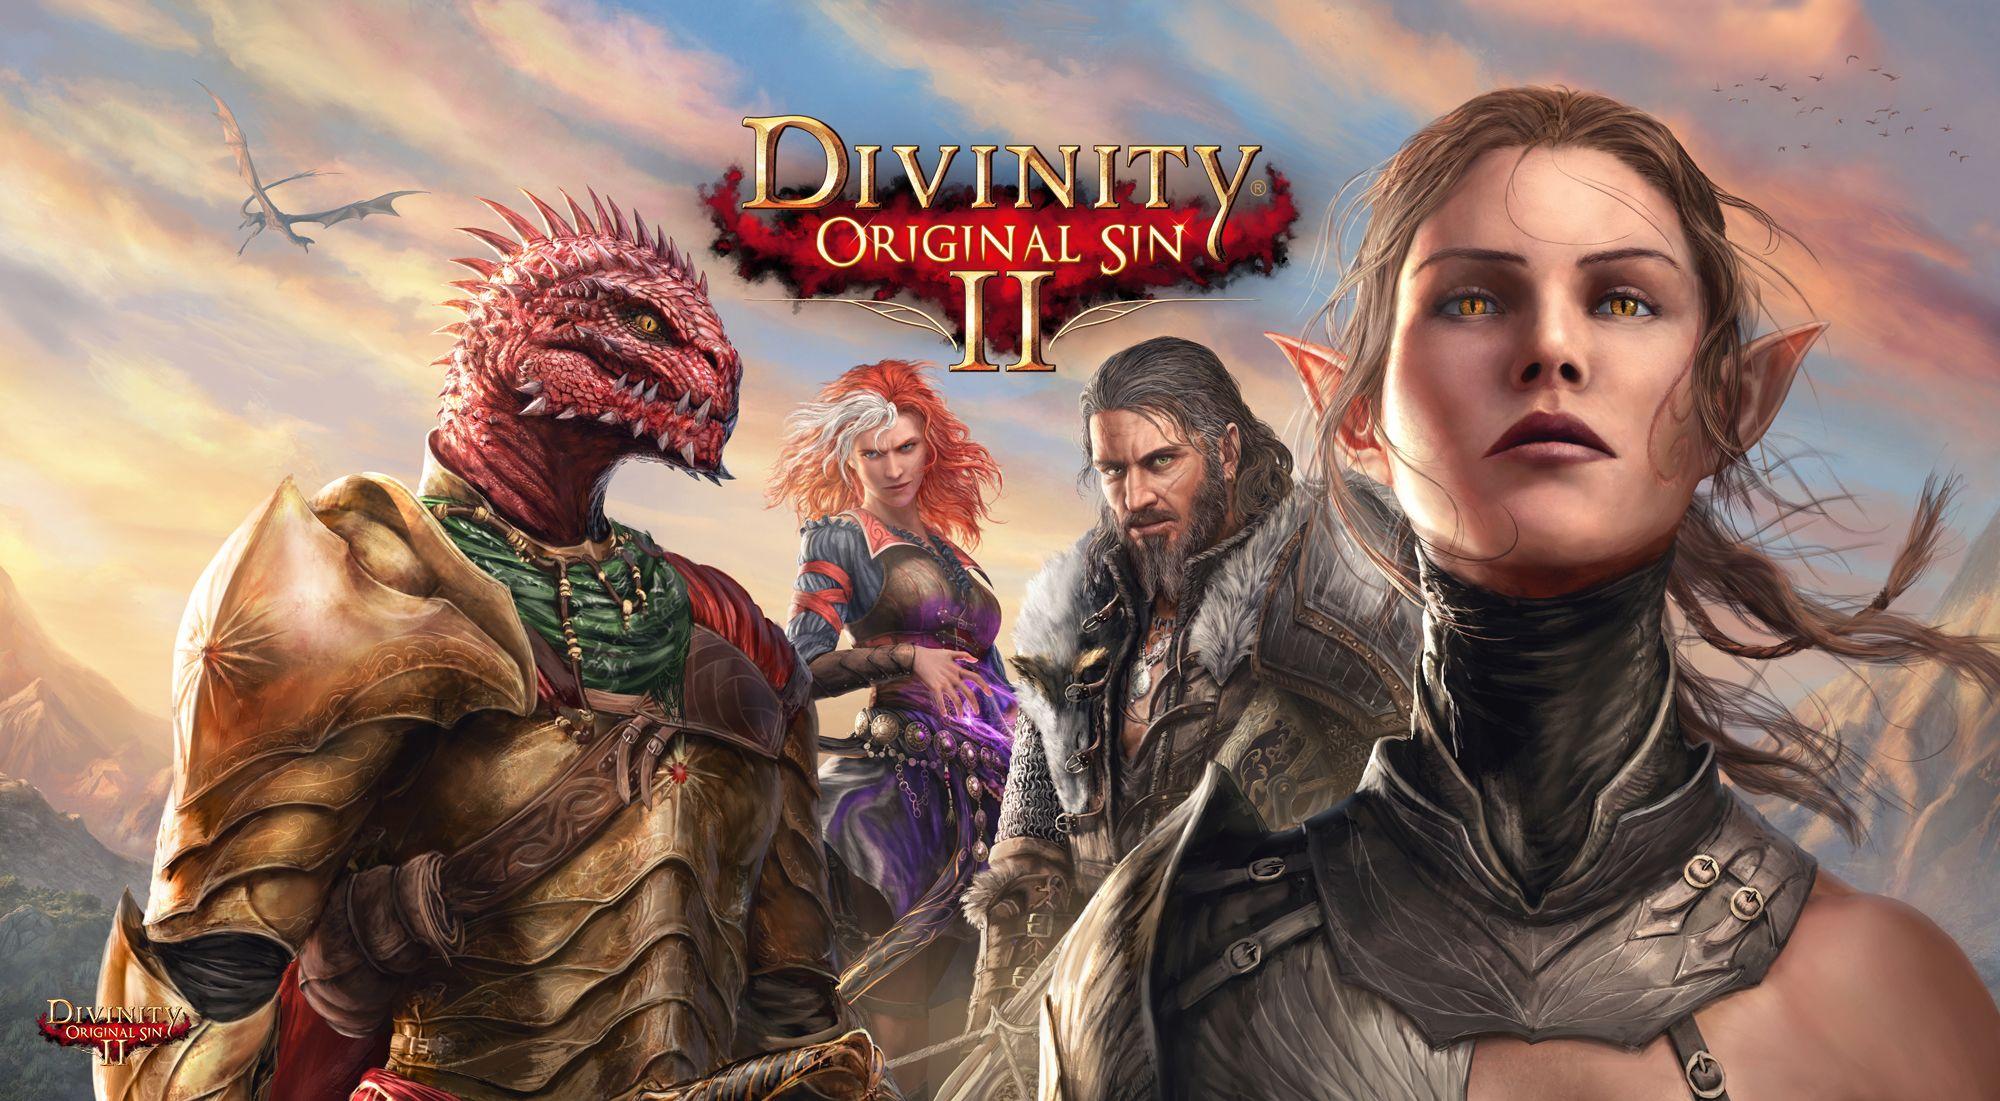 Divinity Original Sin 2 overview